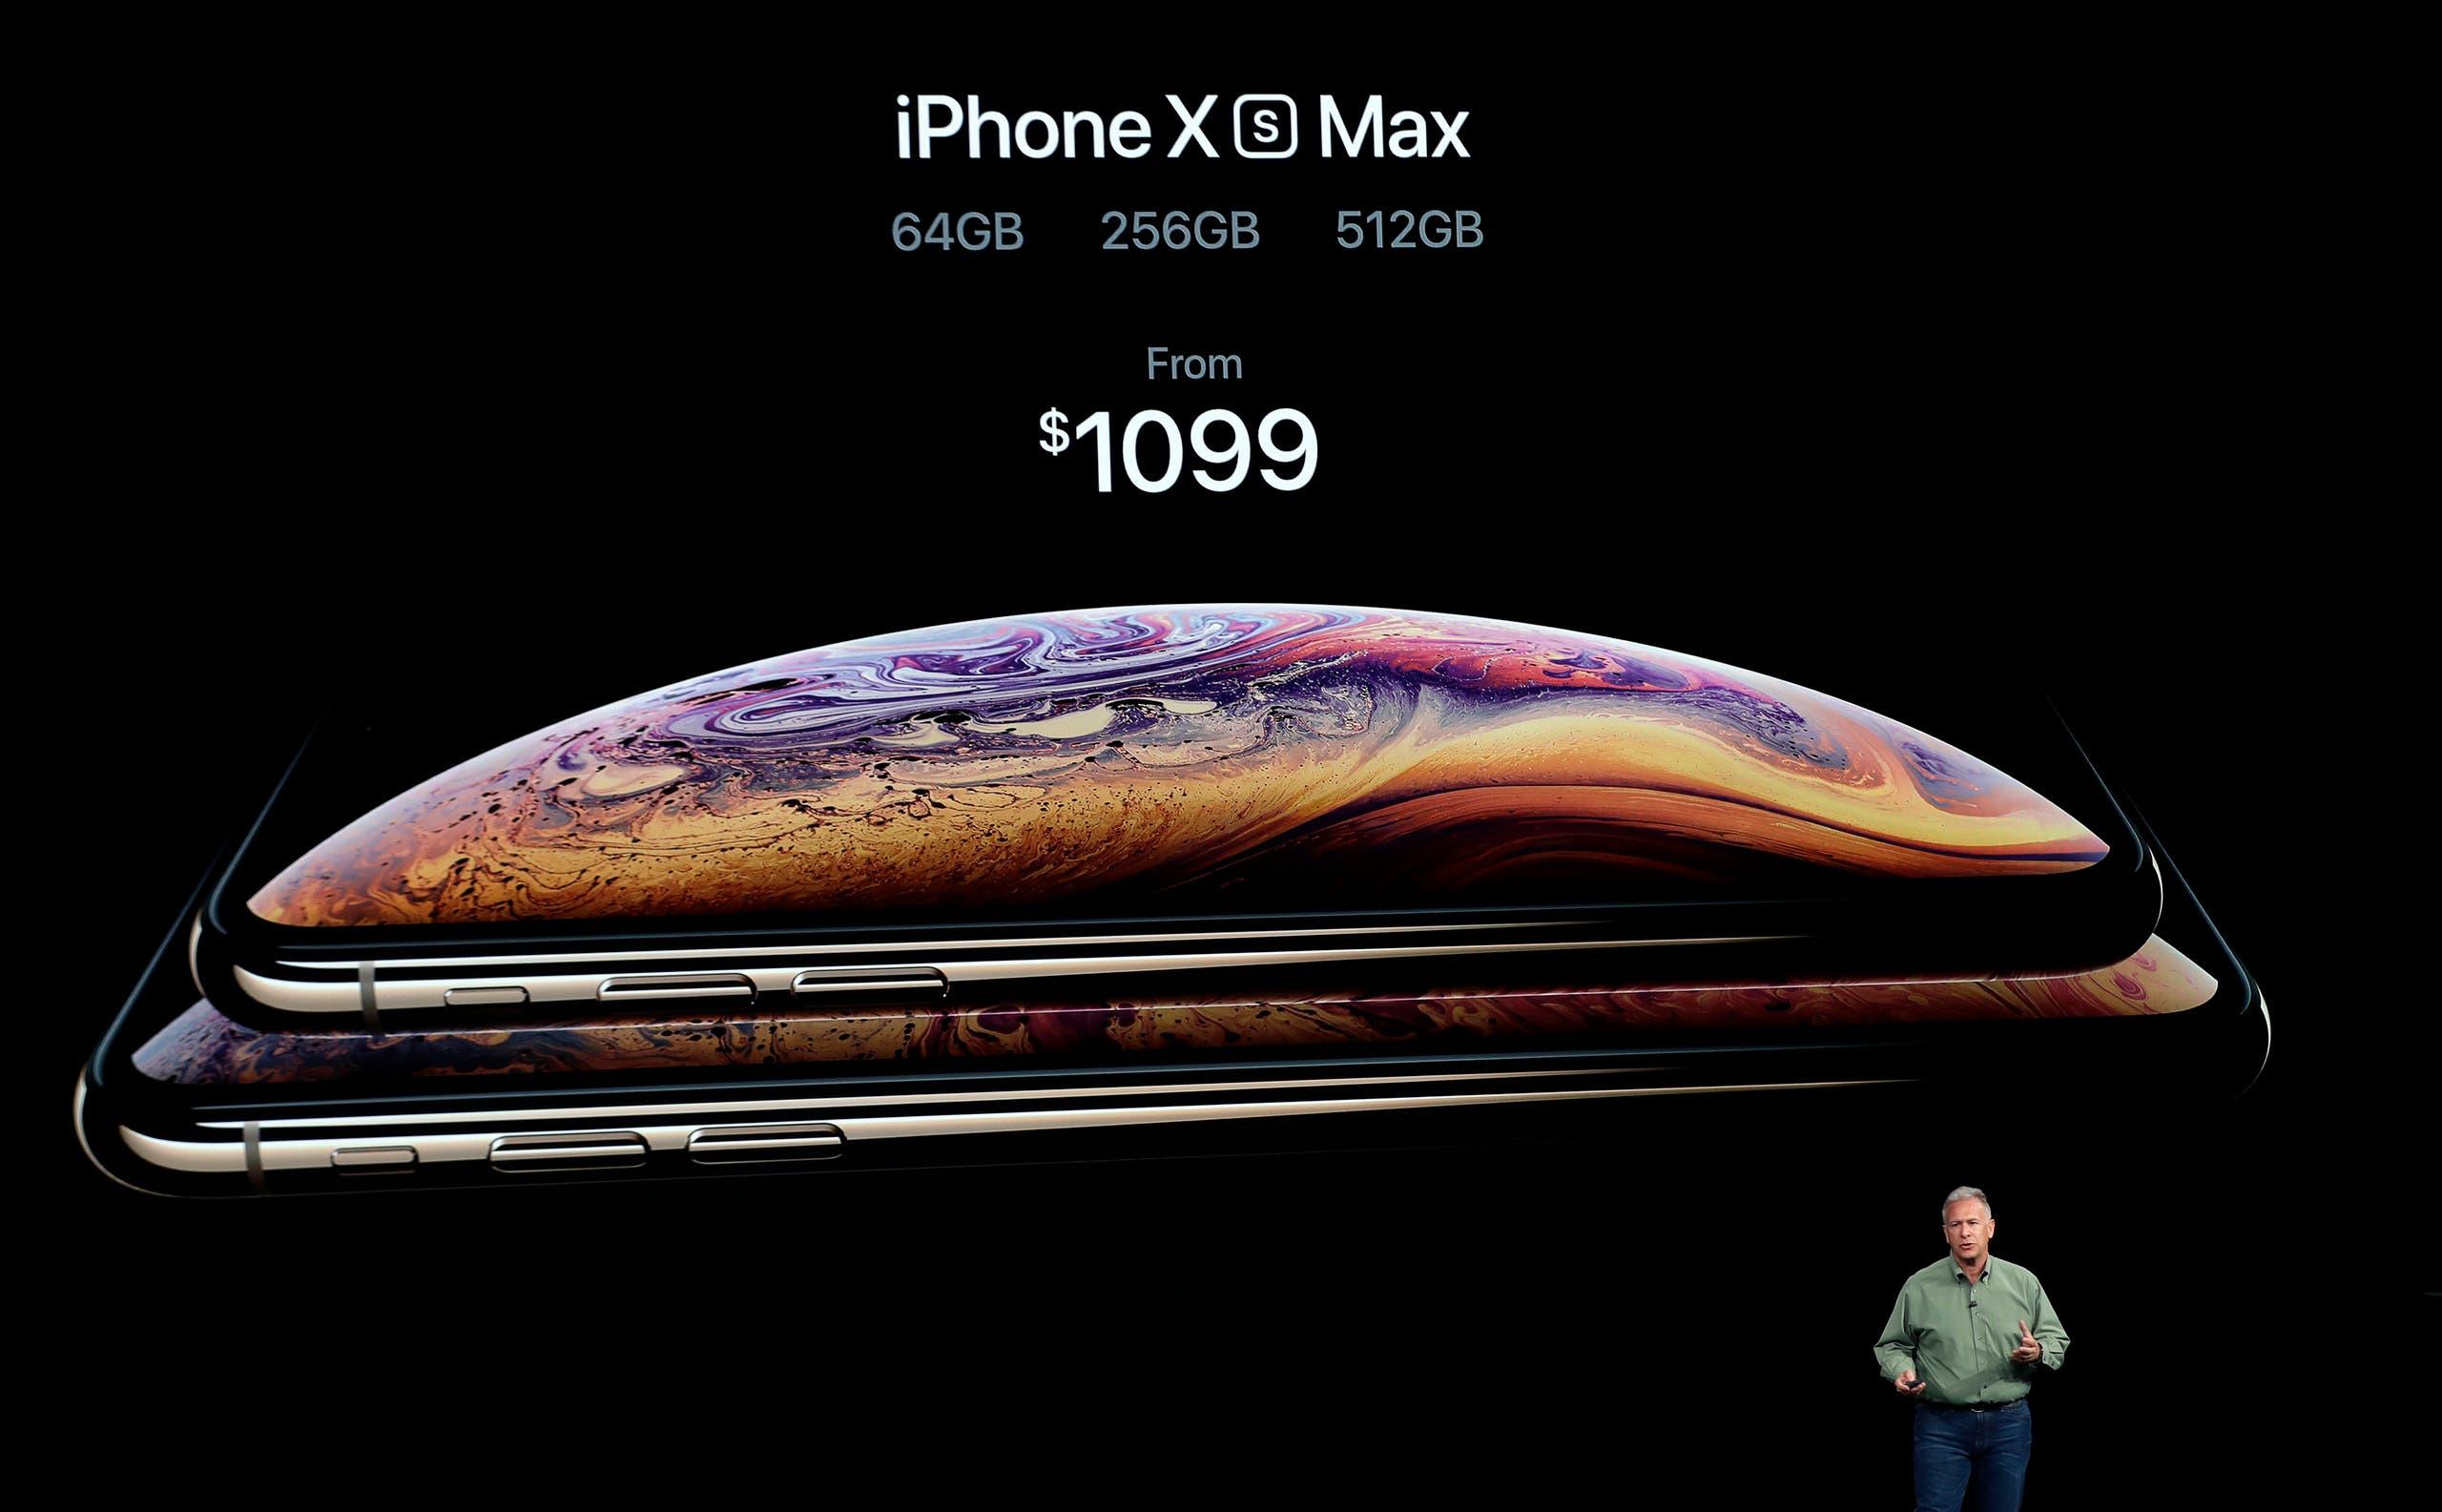 fde12516 7e48 48e8 b82f 44536fbad5bd سعر ومواصفات هواتف ايفون الجديدة،XSg ,Xmaxg ,Xr